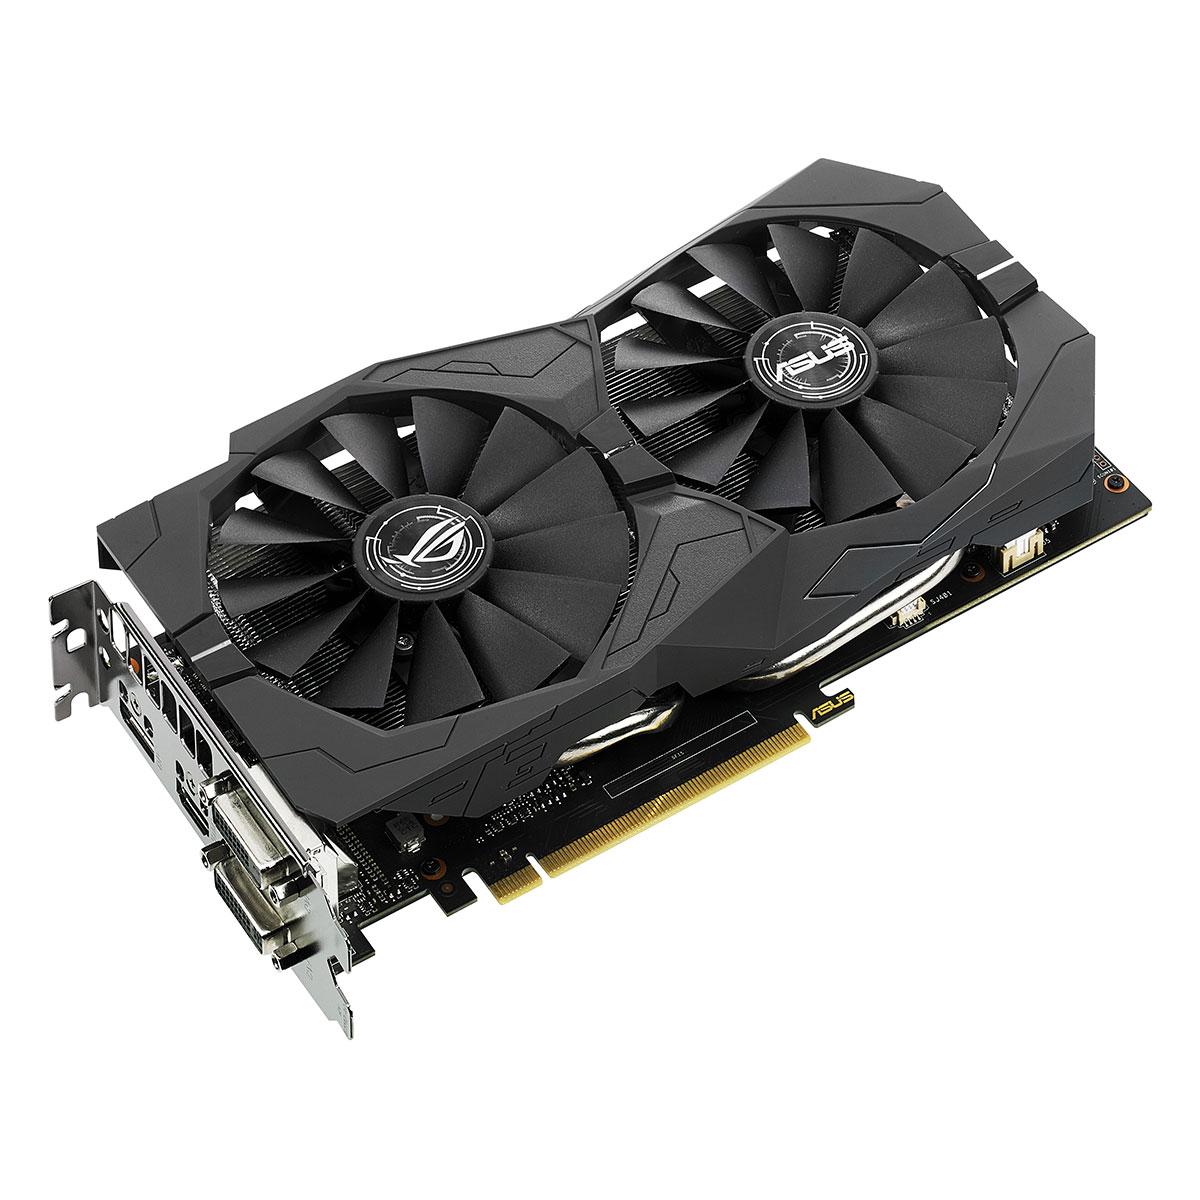 Carte graphique ASUS GeForce GTX 1050 Ti - ROG STRIX-GTX1050TI-4G-GAMING 4096 Mo Dual DVI/HDMI/DisplayPort - PCI Express (NVIDIA GeForce avec CUDA GTX 1050 Ti)